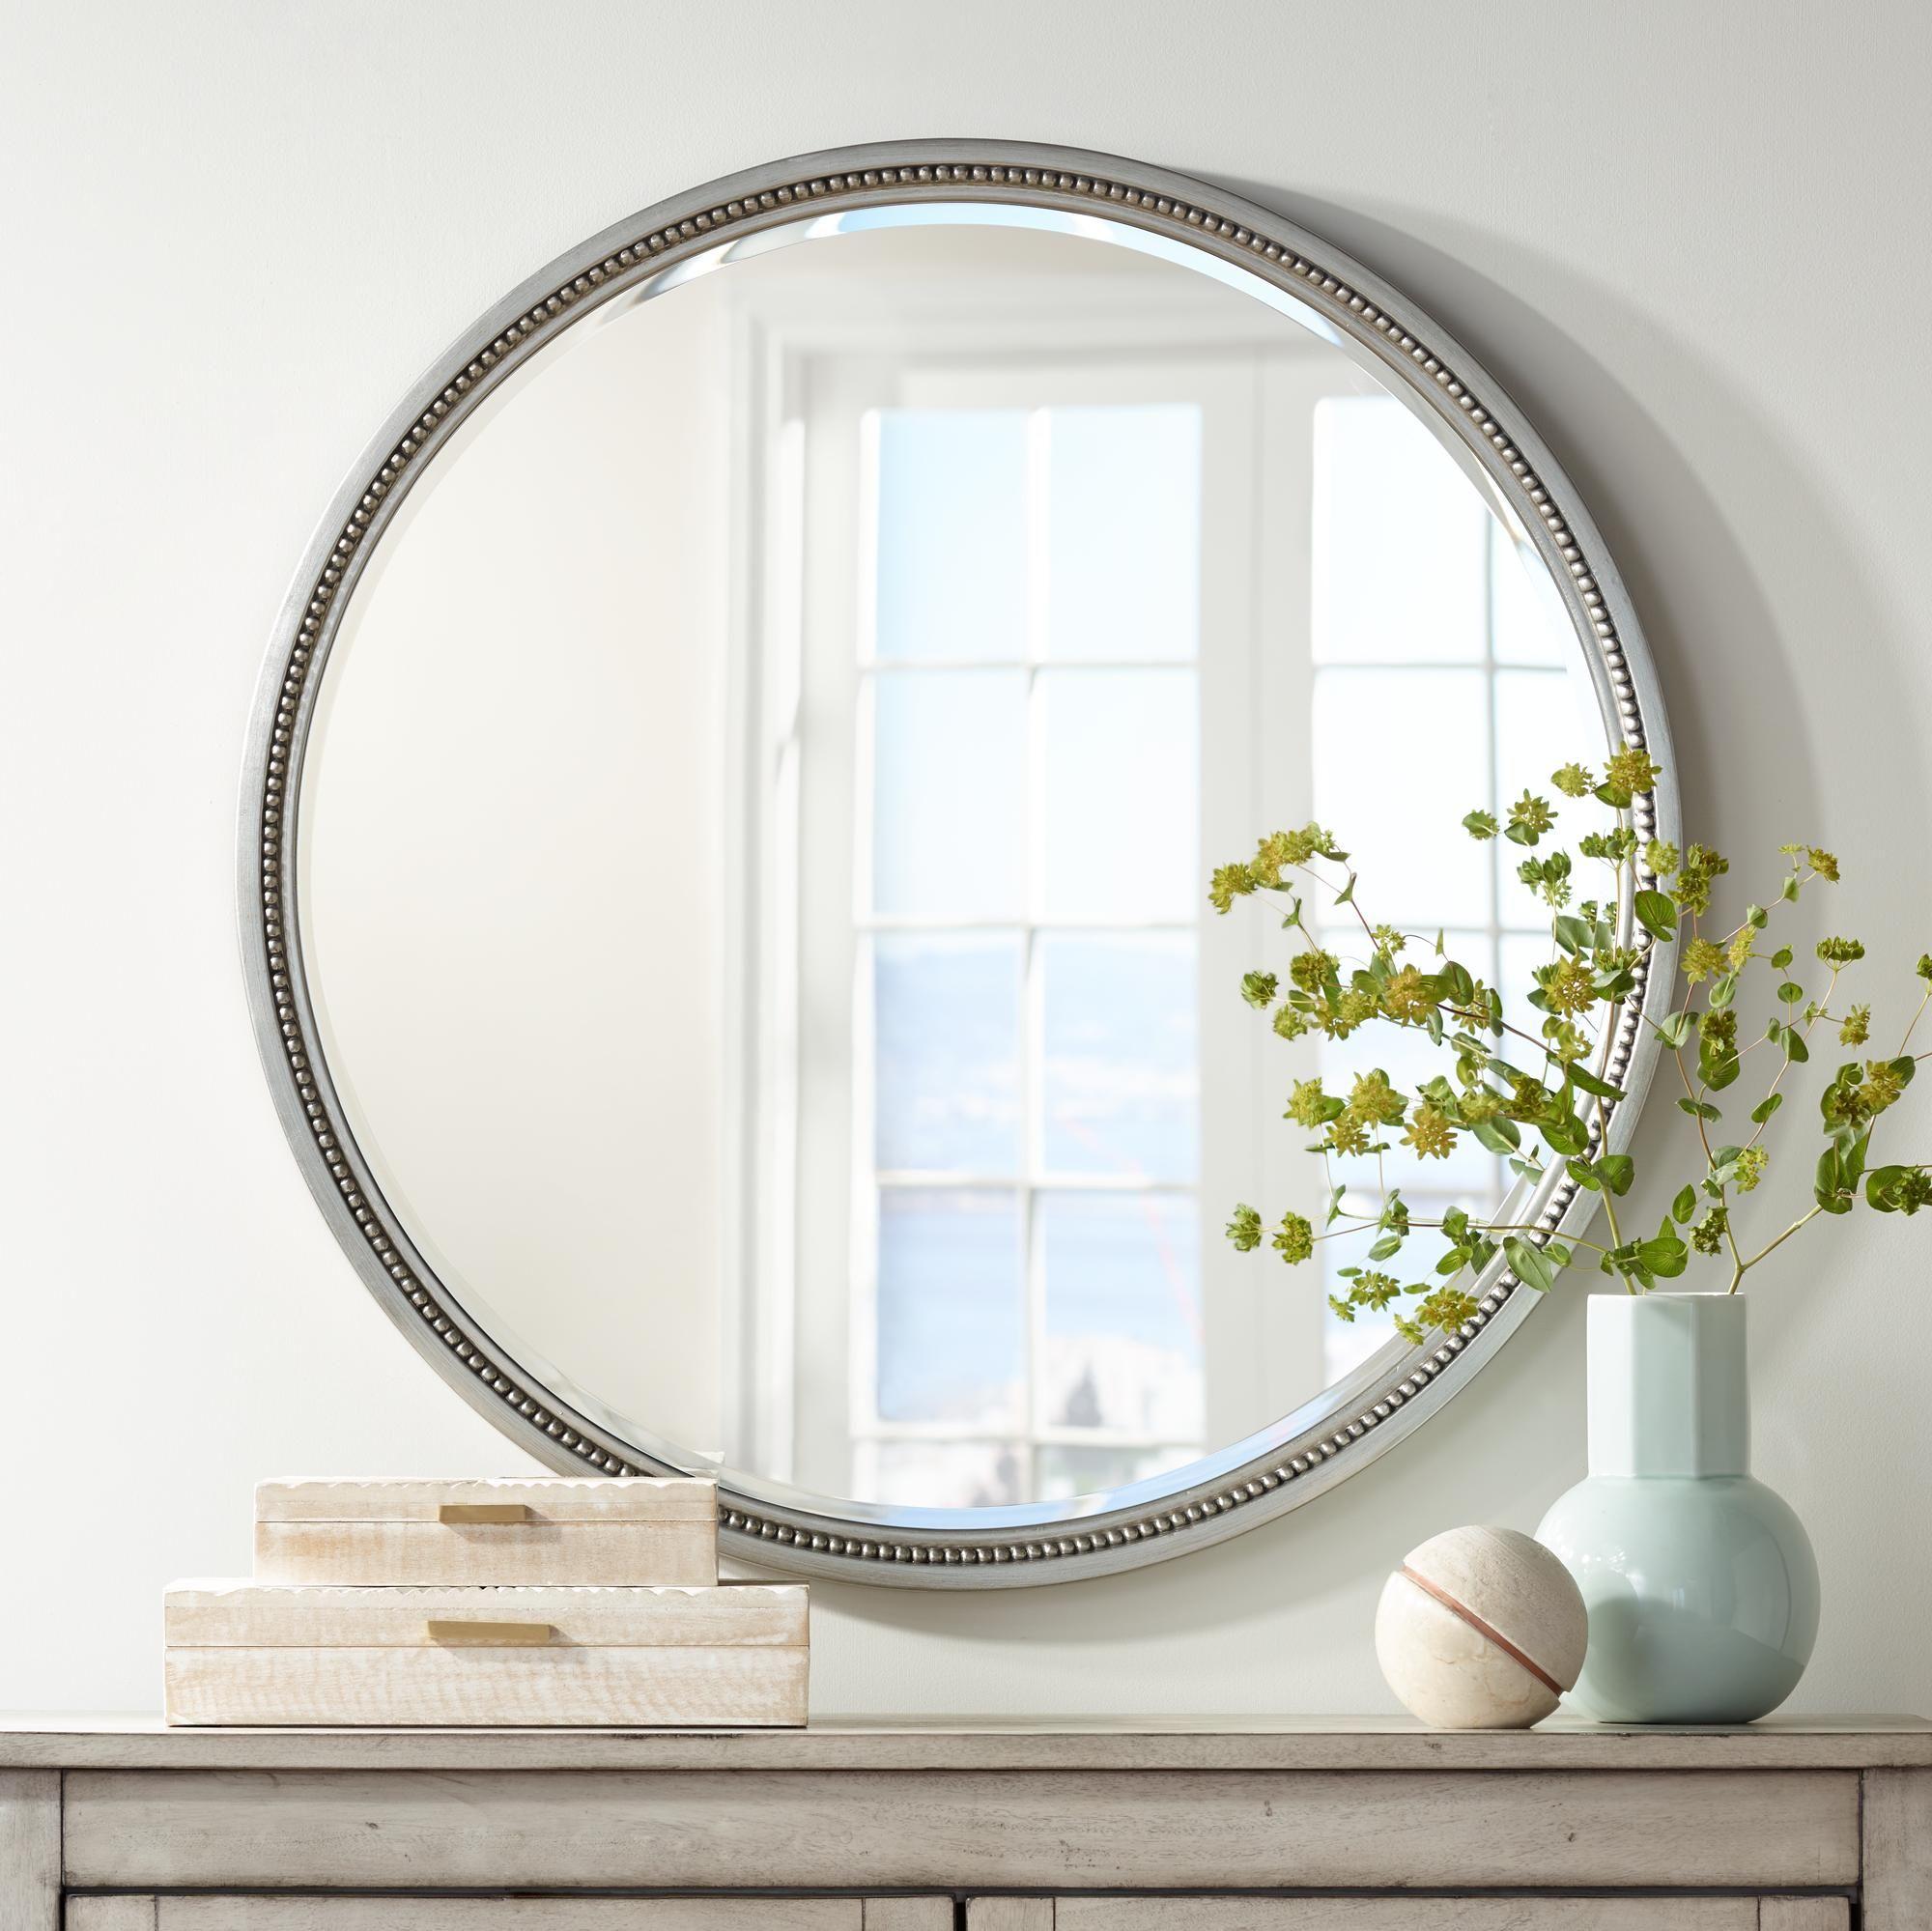 Mirrors Lorraine Silver 32 3 4 Round Beaded Trim Wall Mirror In 2020 Mirror Dining Room Mirror Wall Round Wall Mirror